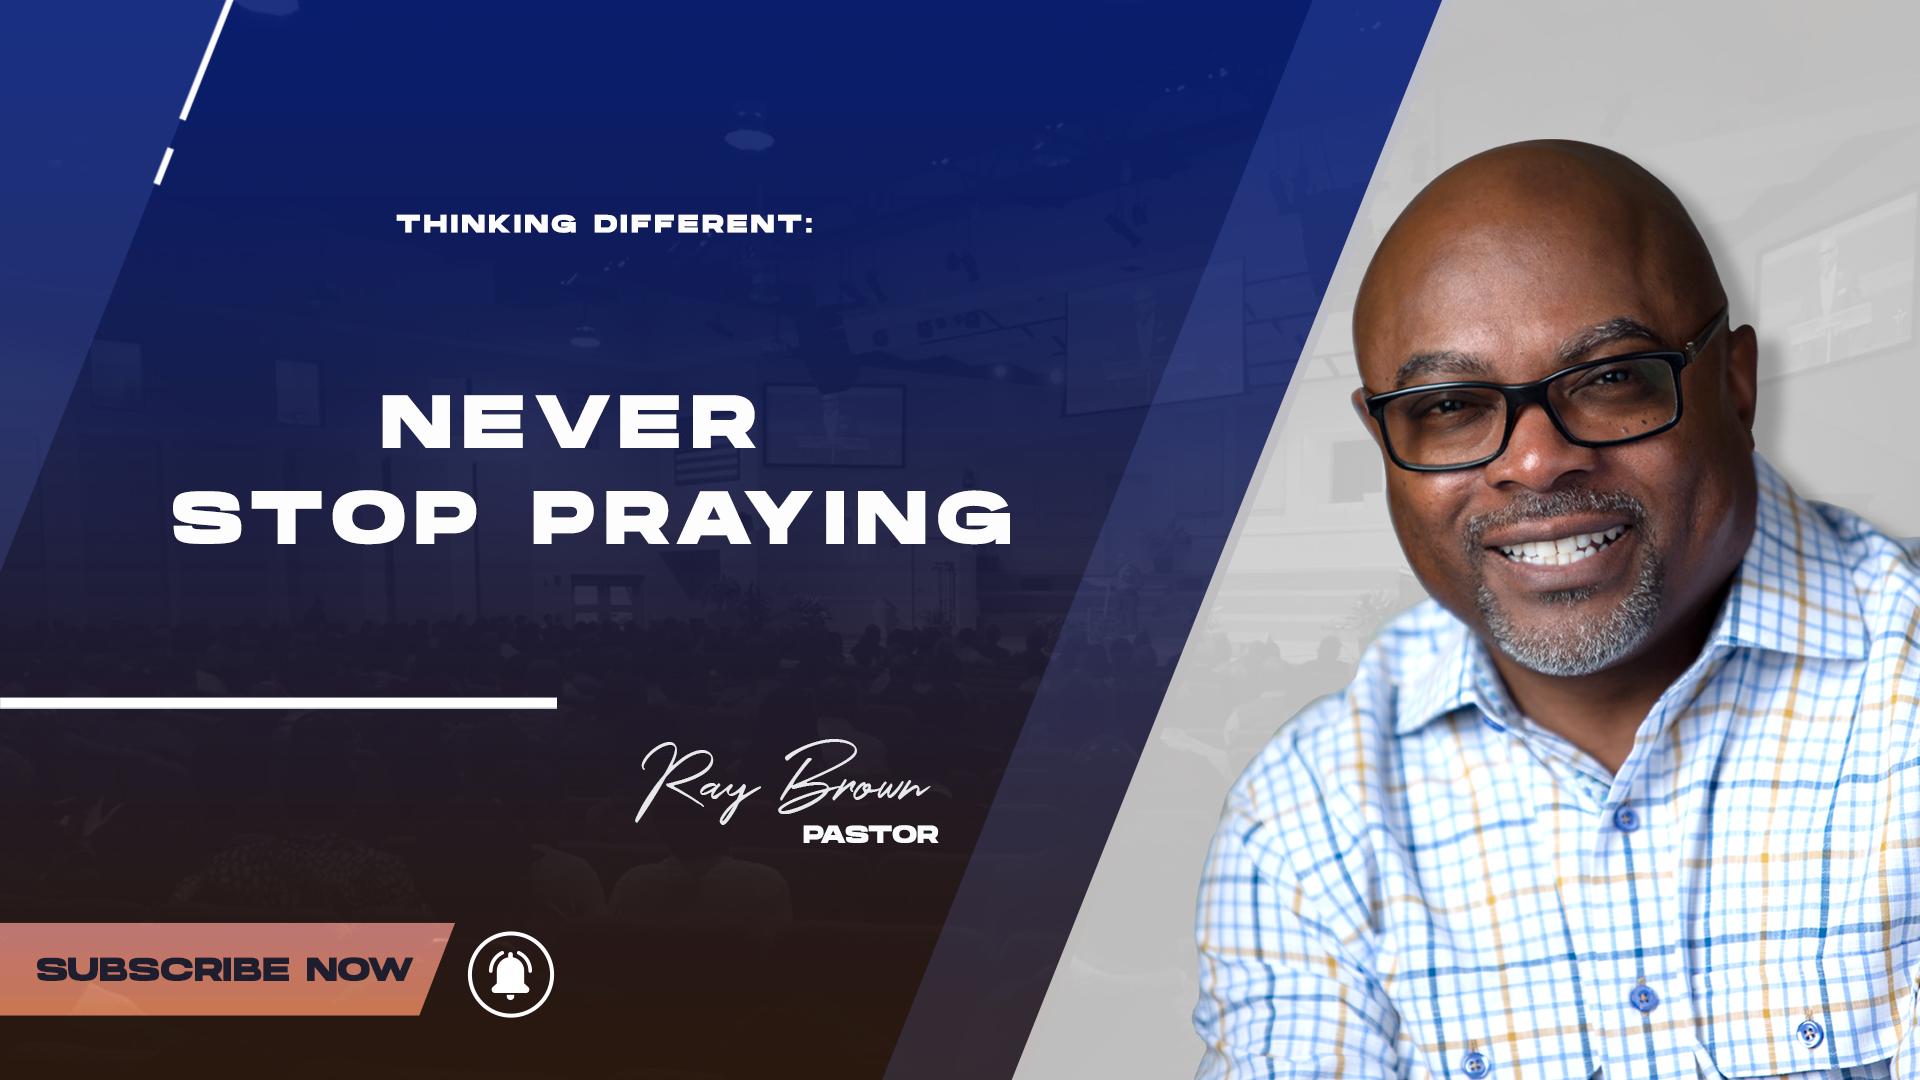 020721 NEVER STOP PRAYING